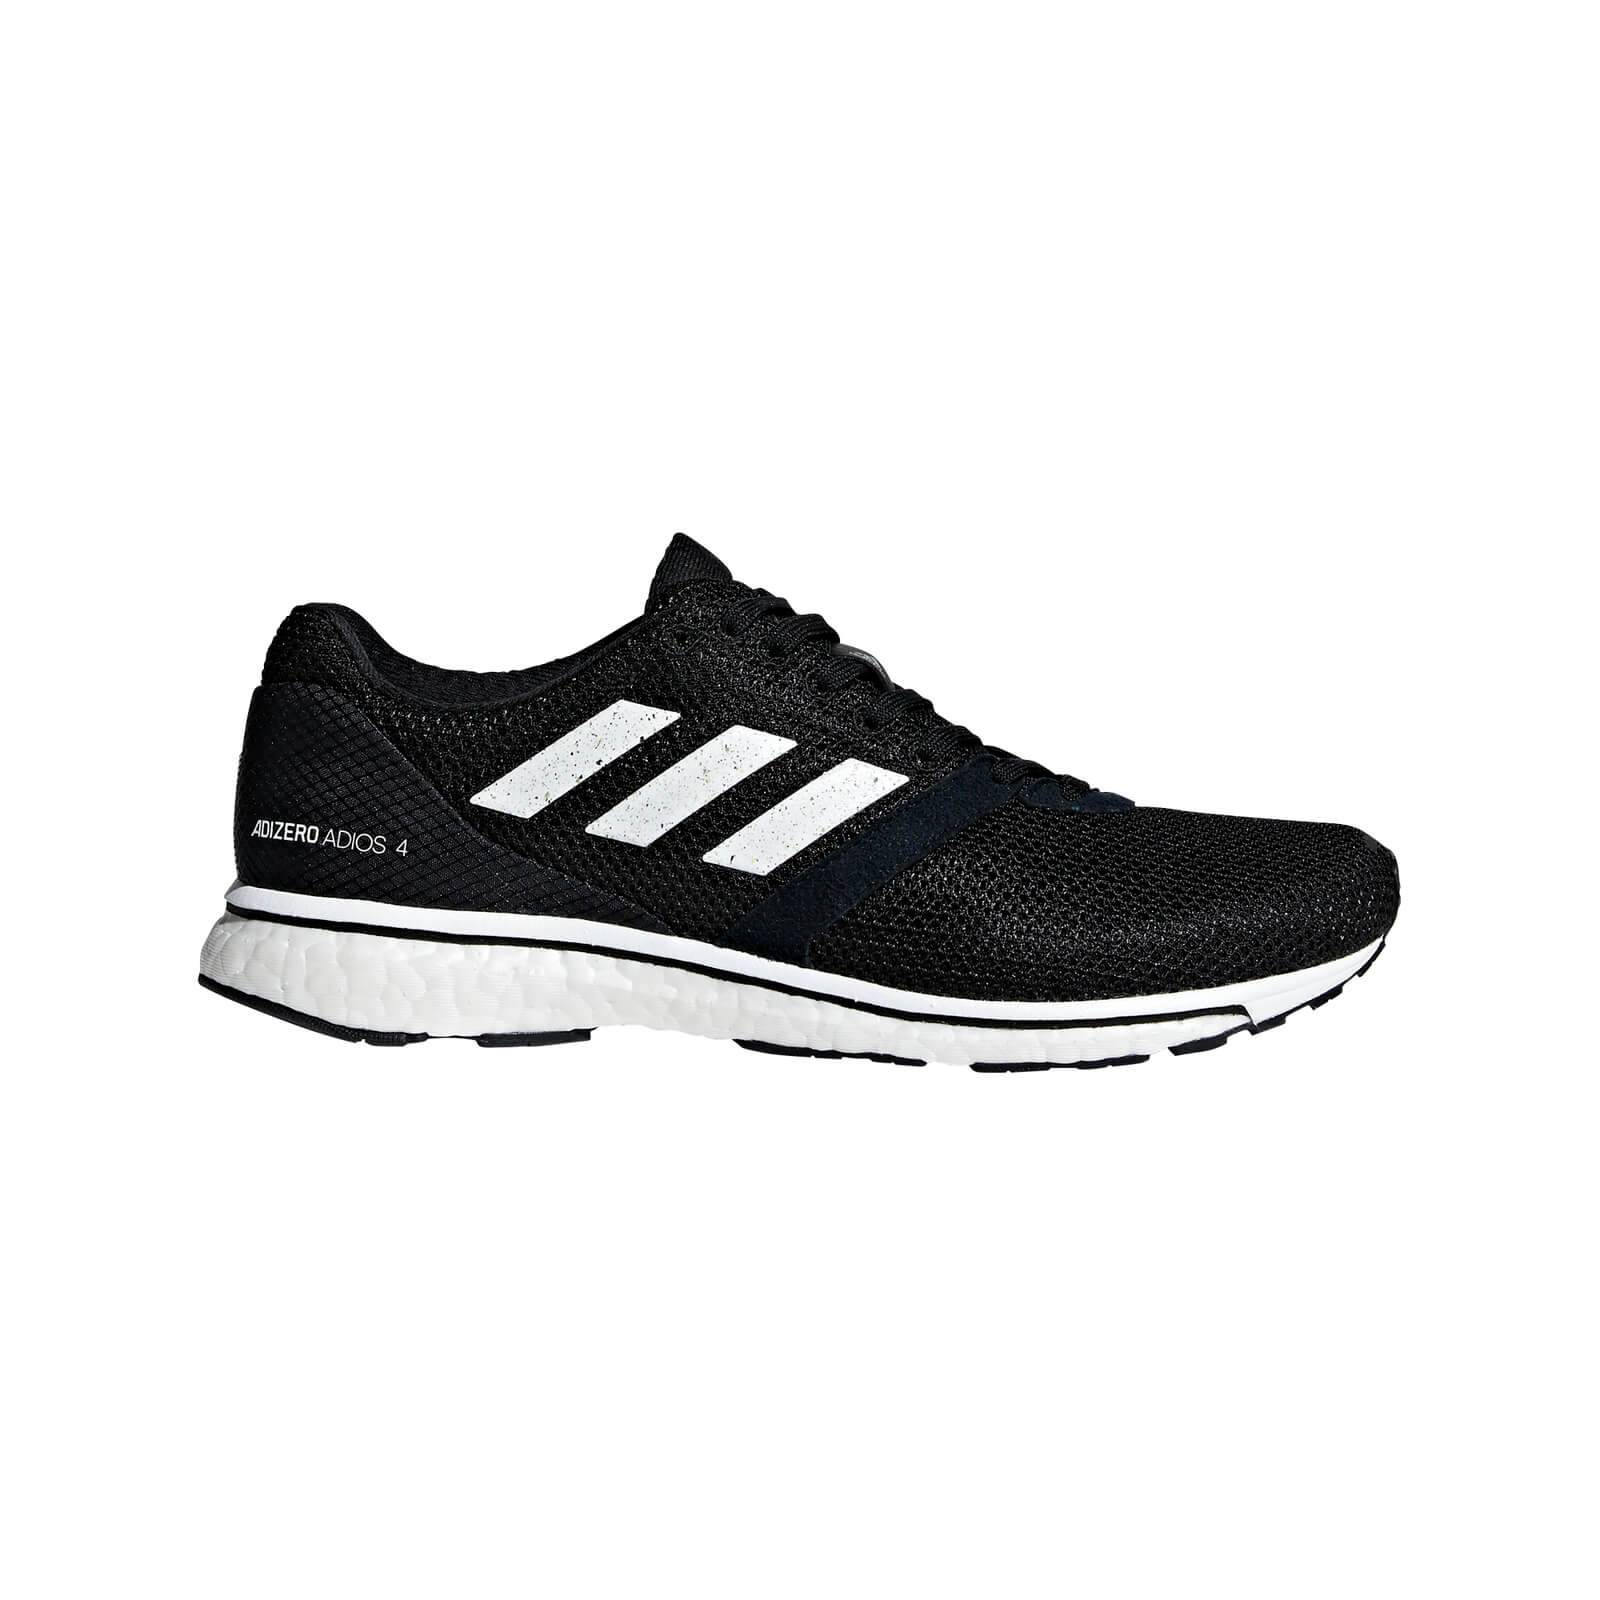 adidas Women's Adizero Adios 4 Running Shoes - Black/White - US 7.5/UK 6 - Black/White